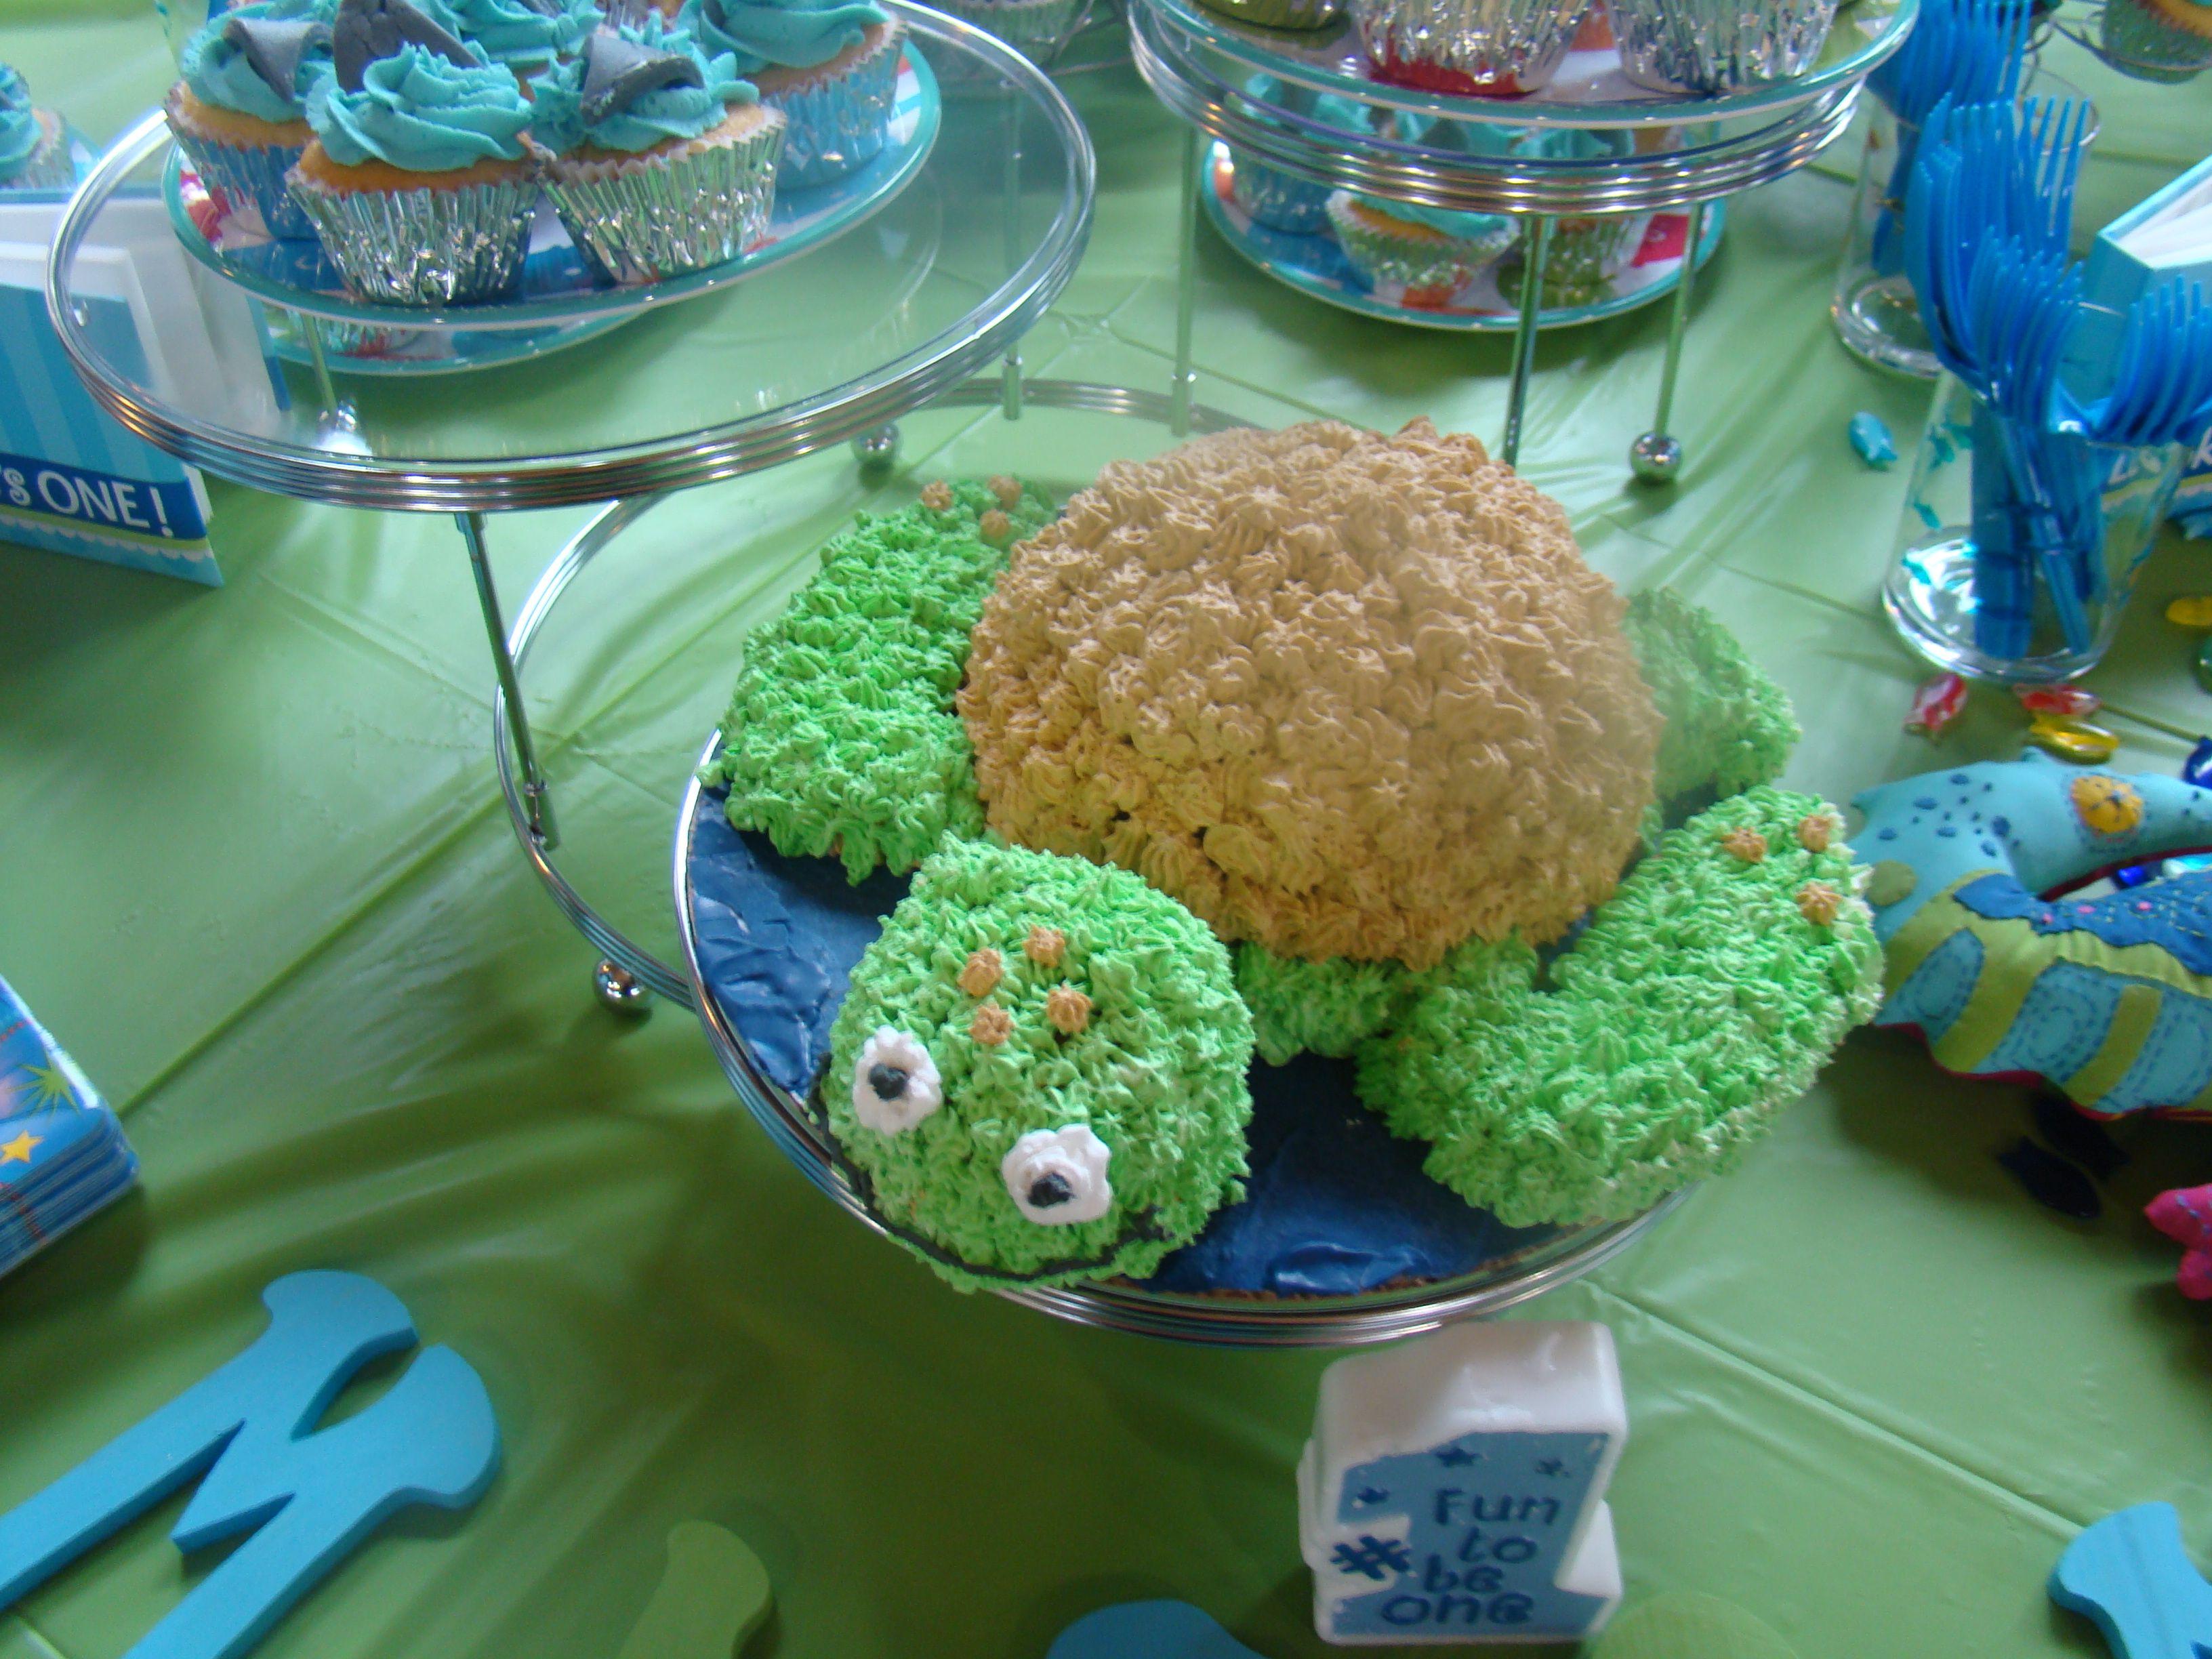 Aquarium themed 1st birthday at the zoo. Smash cake.